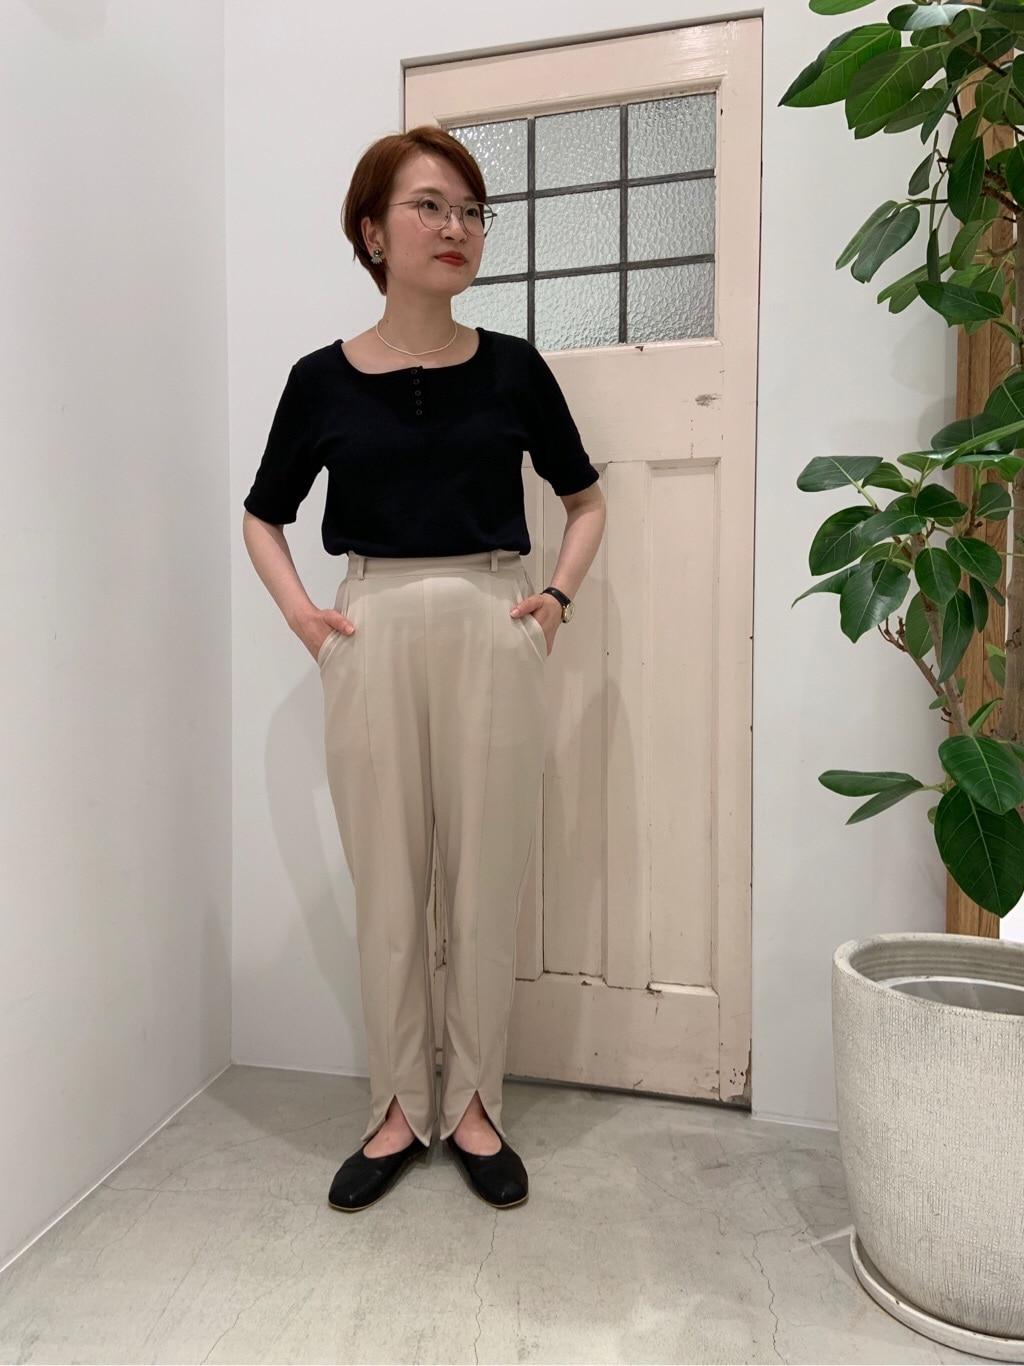 Dot and Stripes CHILD WOMAN ペリエ千葉 身長:160cm 2019.07.25